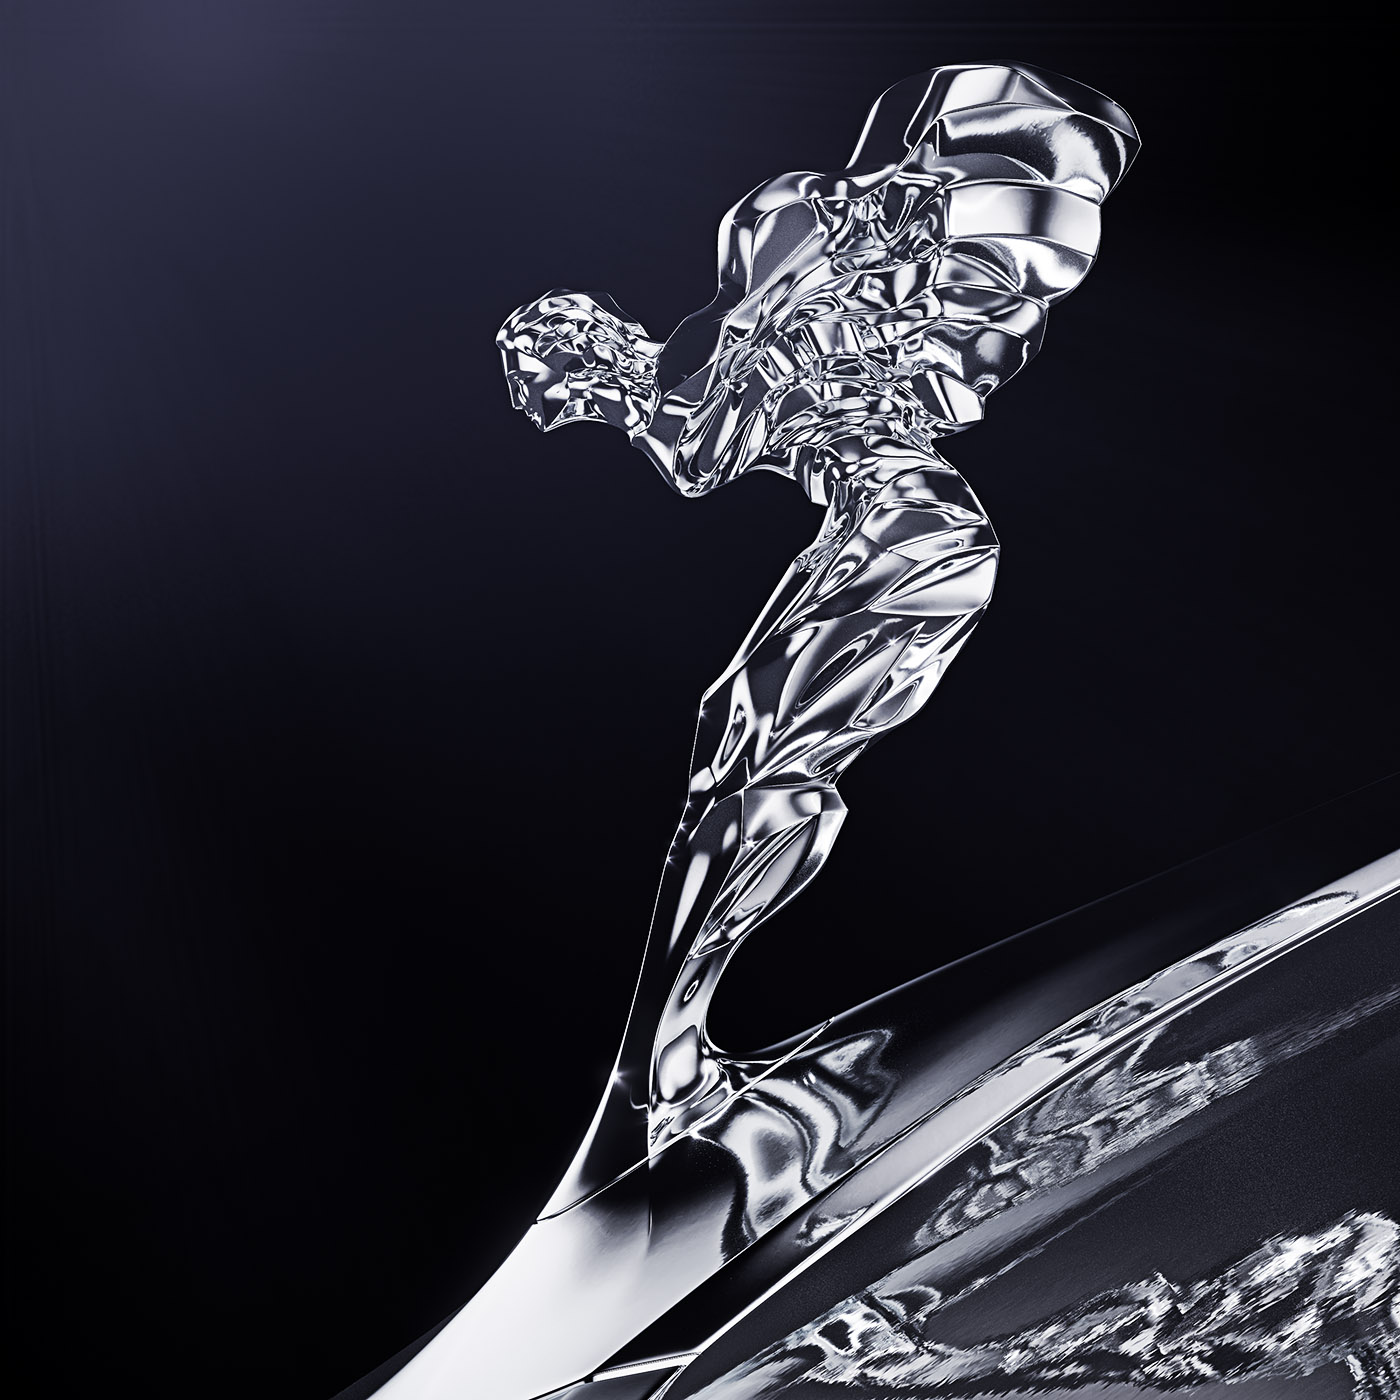 Rolls Royce luxury automotive design 14.jpg